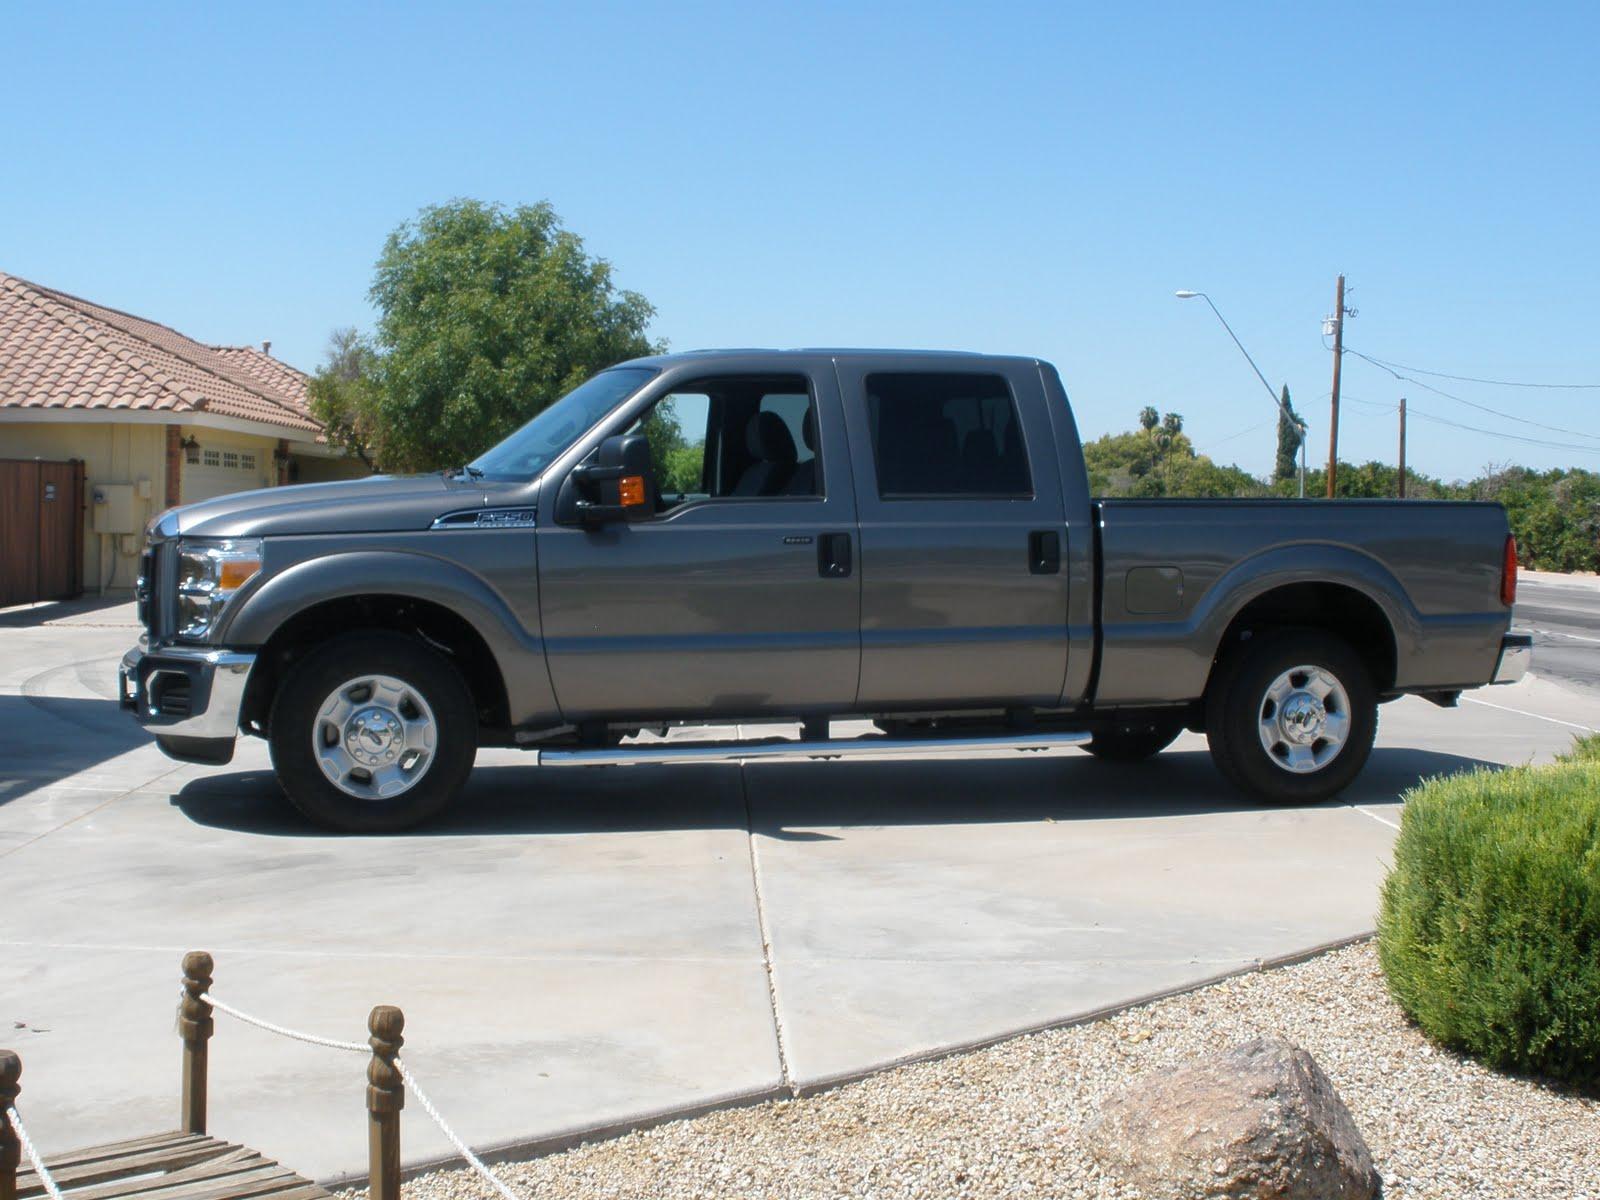 Mello Mikes Truck Camper Adventures  9 4 11   9